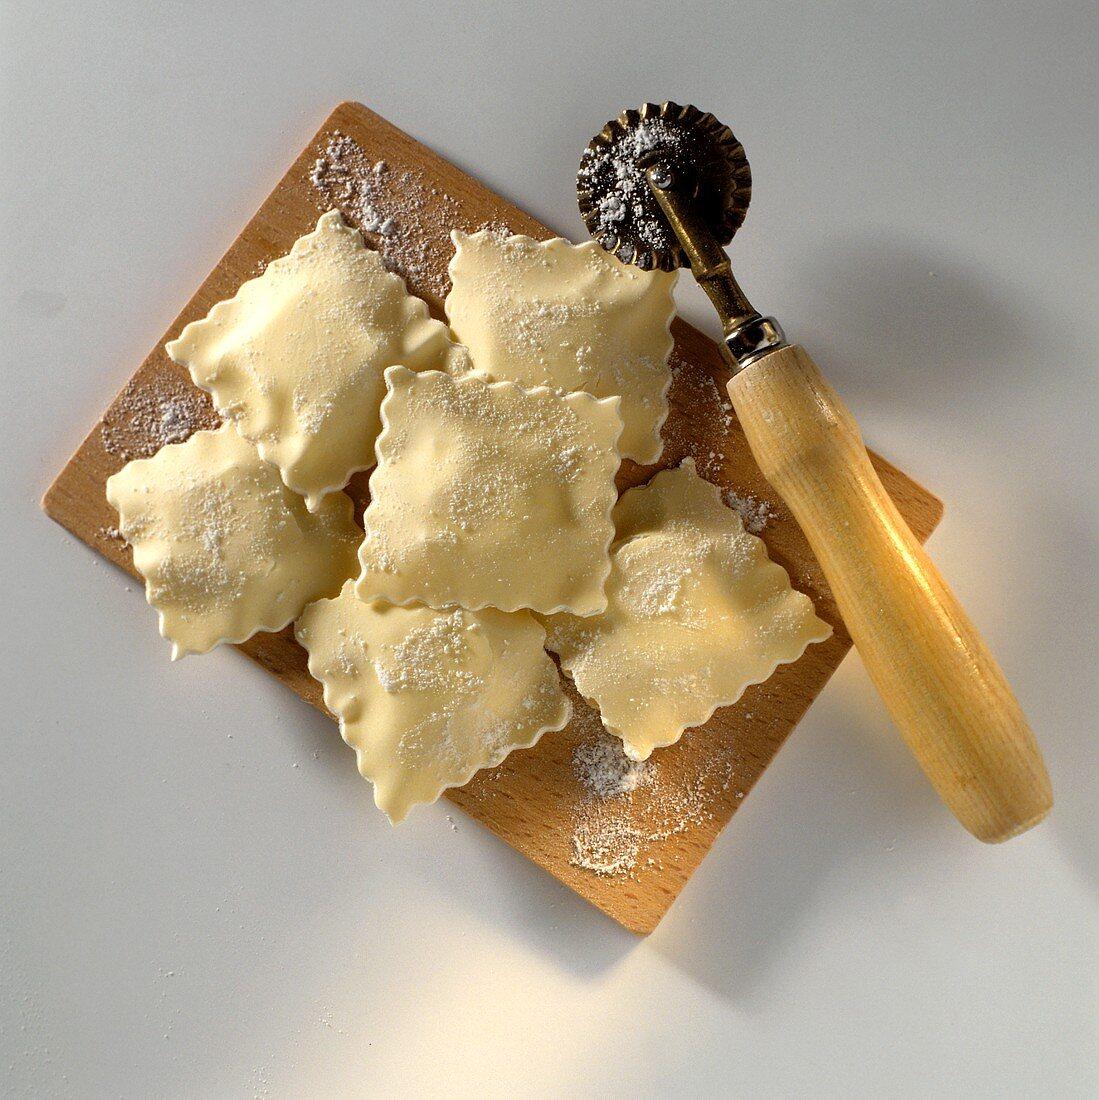 Homemade Ravioli on a Board; Pasta Knife